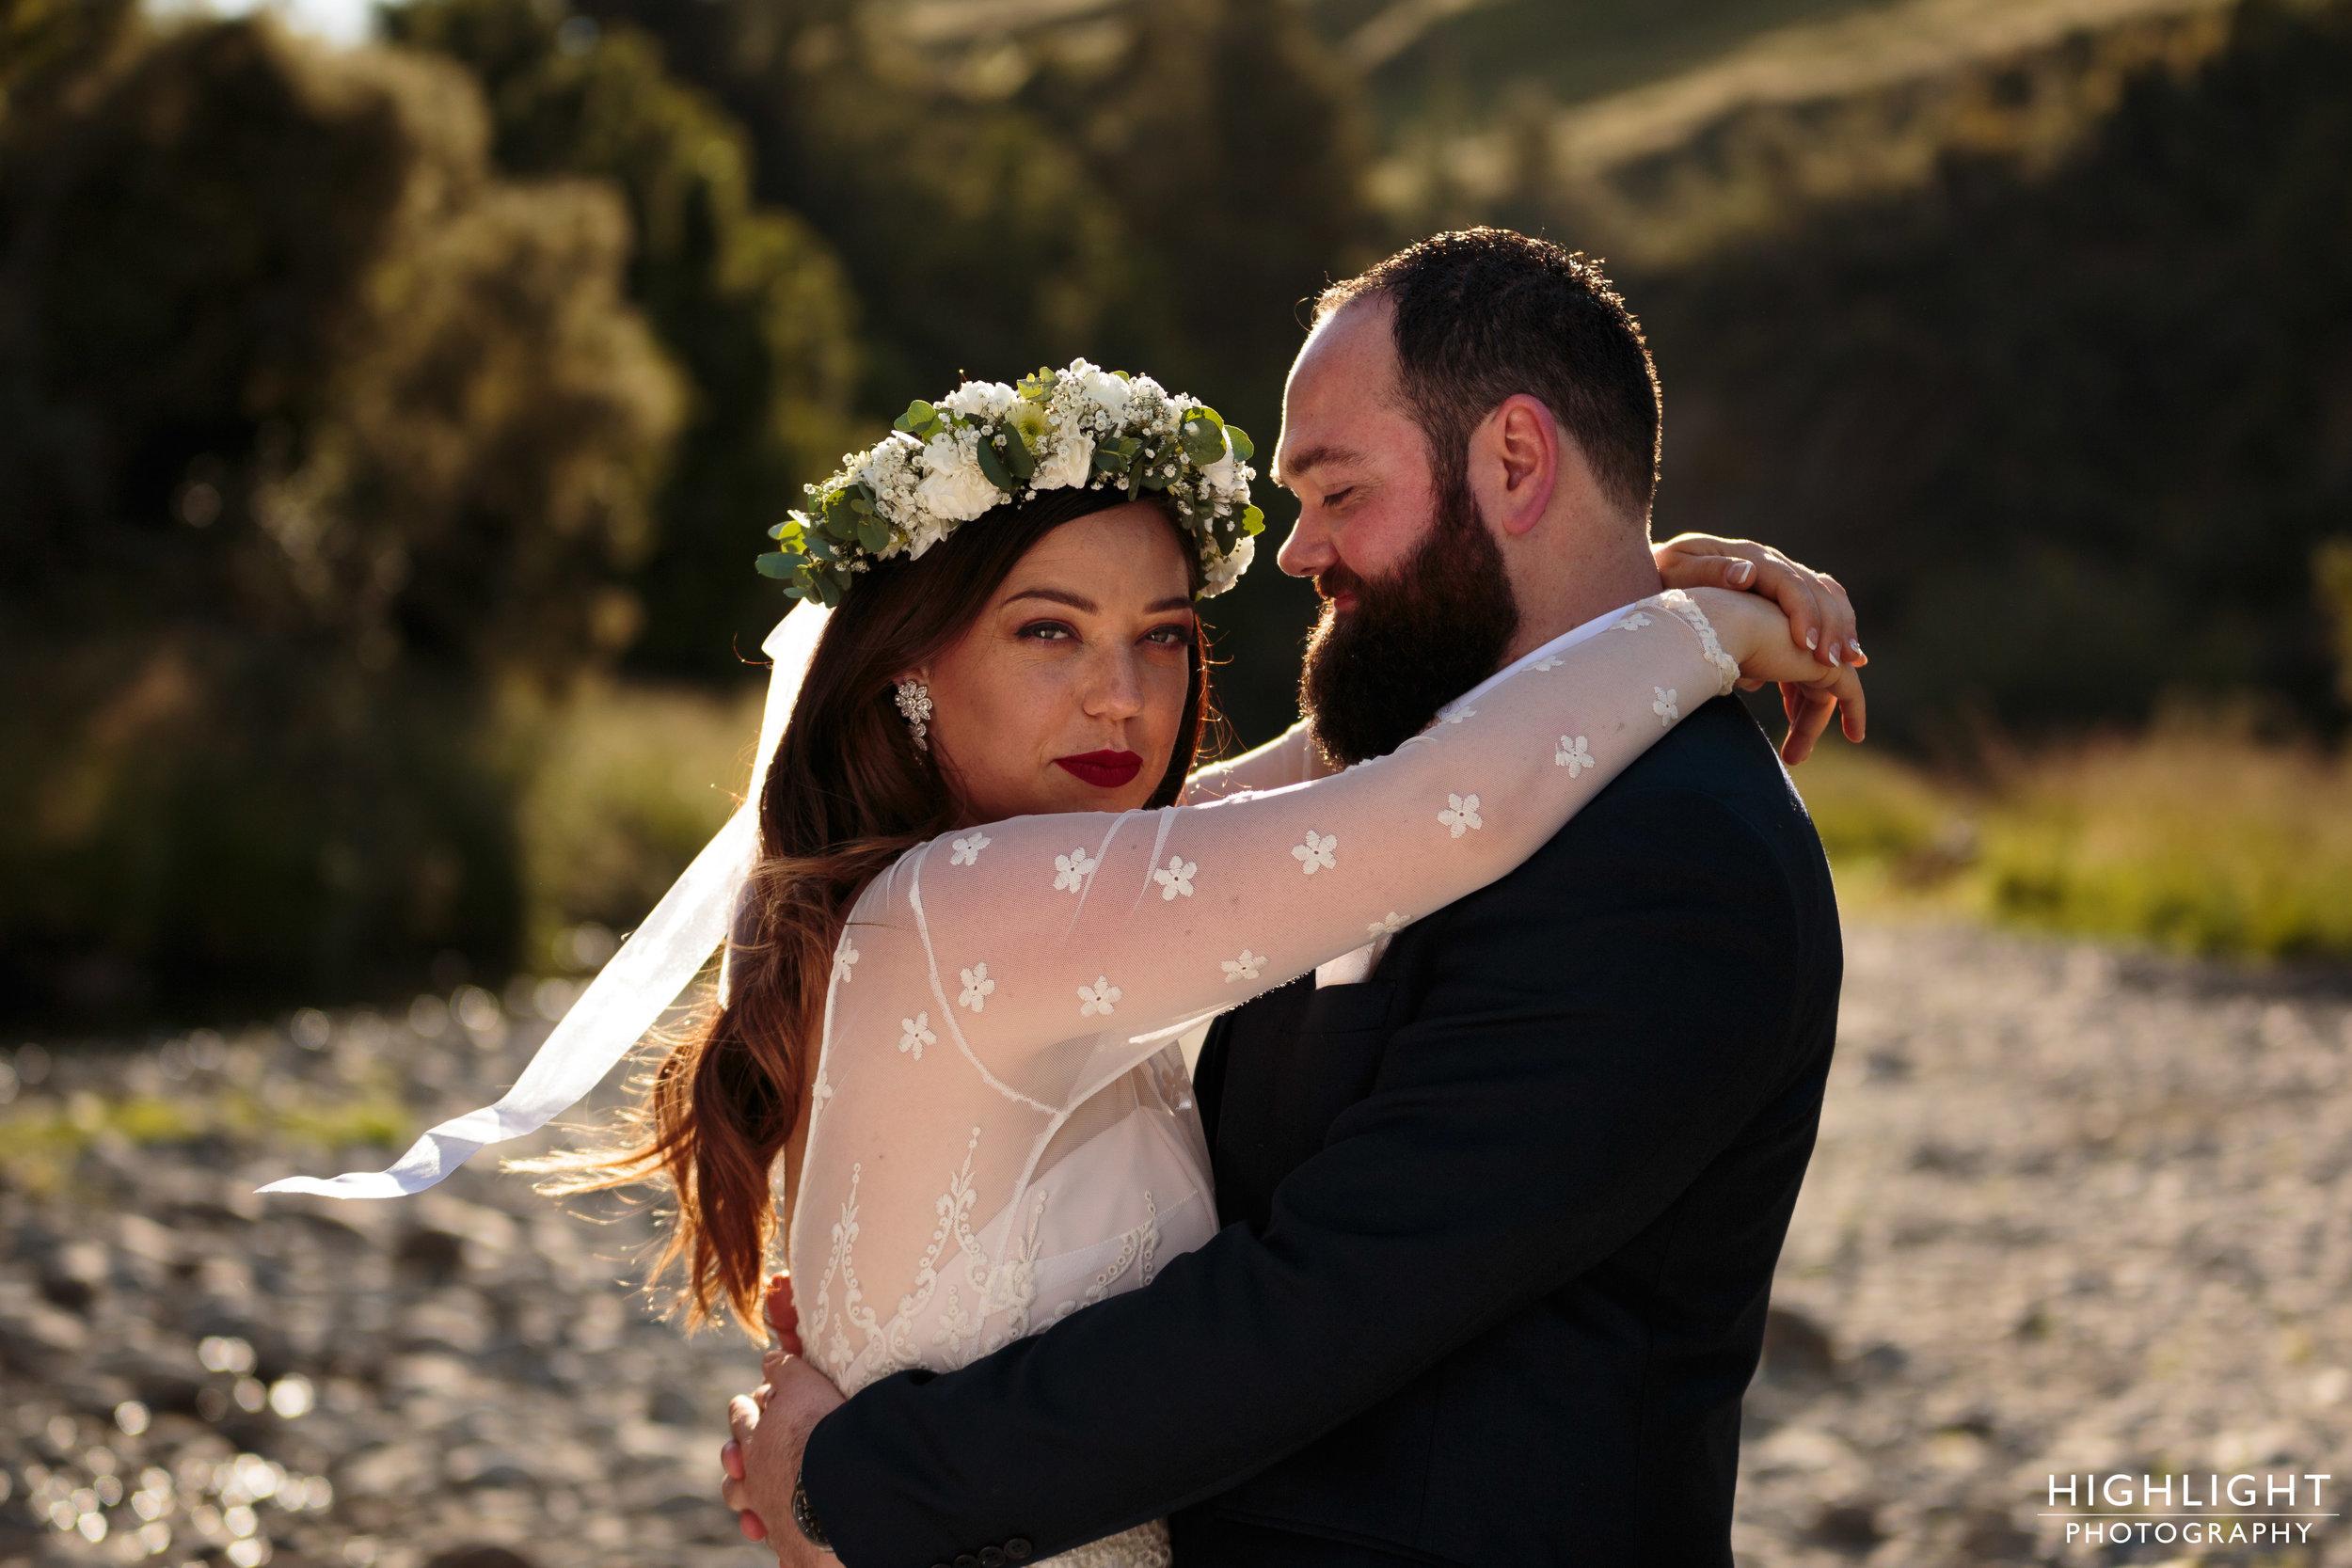 highlight-wedding-photography-new-zealand-makoura-lodge-wedding-138.jpg